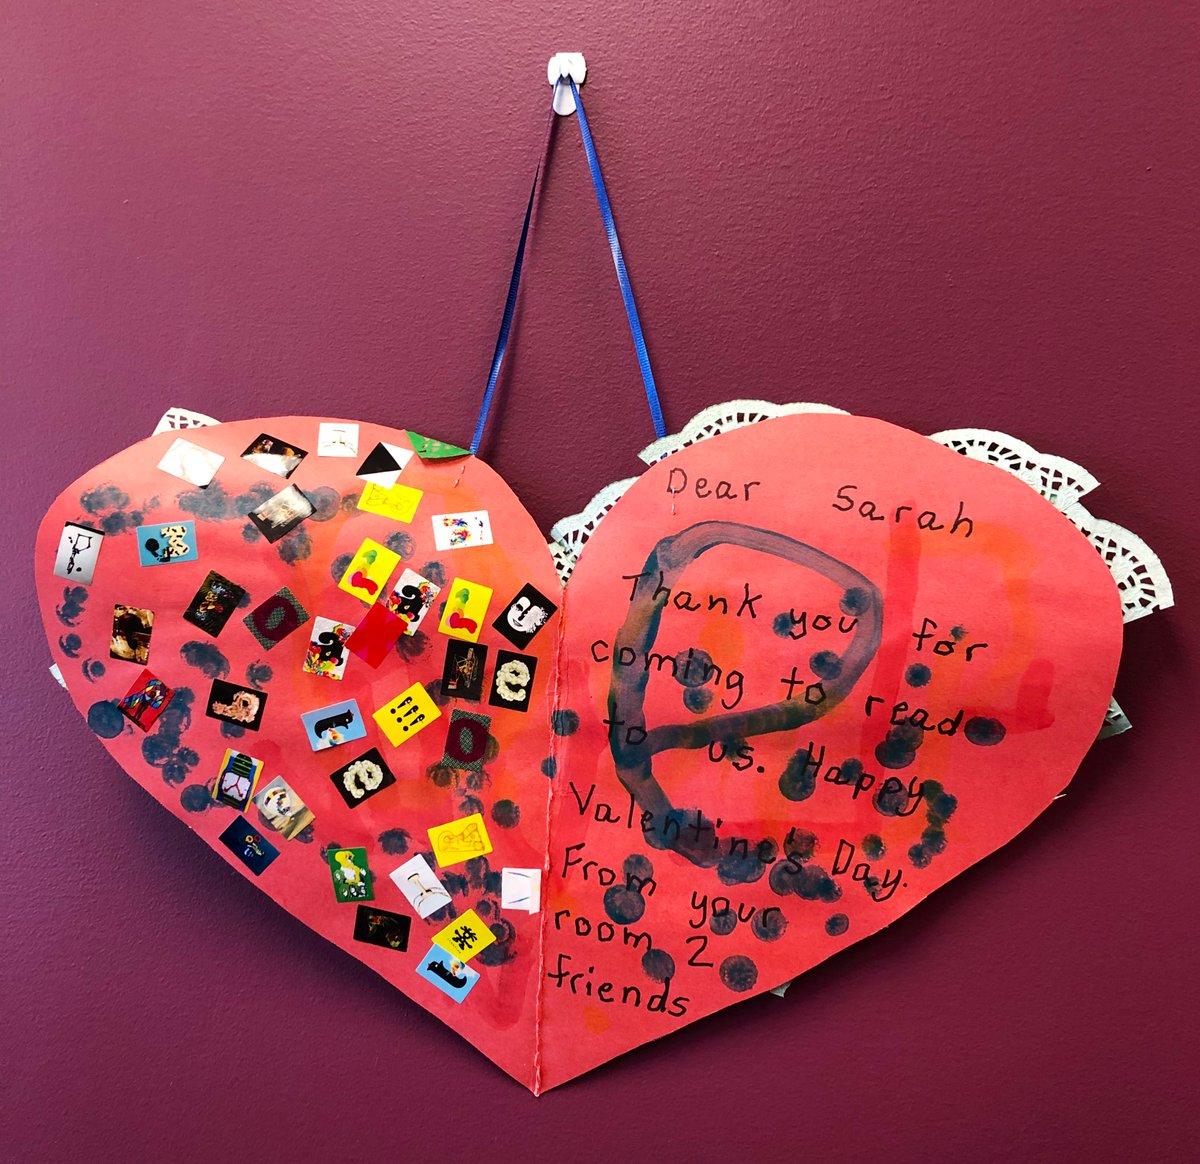 test Twitter Media - Thank you for the Valentine's Day card! #mbpoli https://t.co/SjcPtv41bS